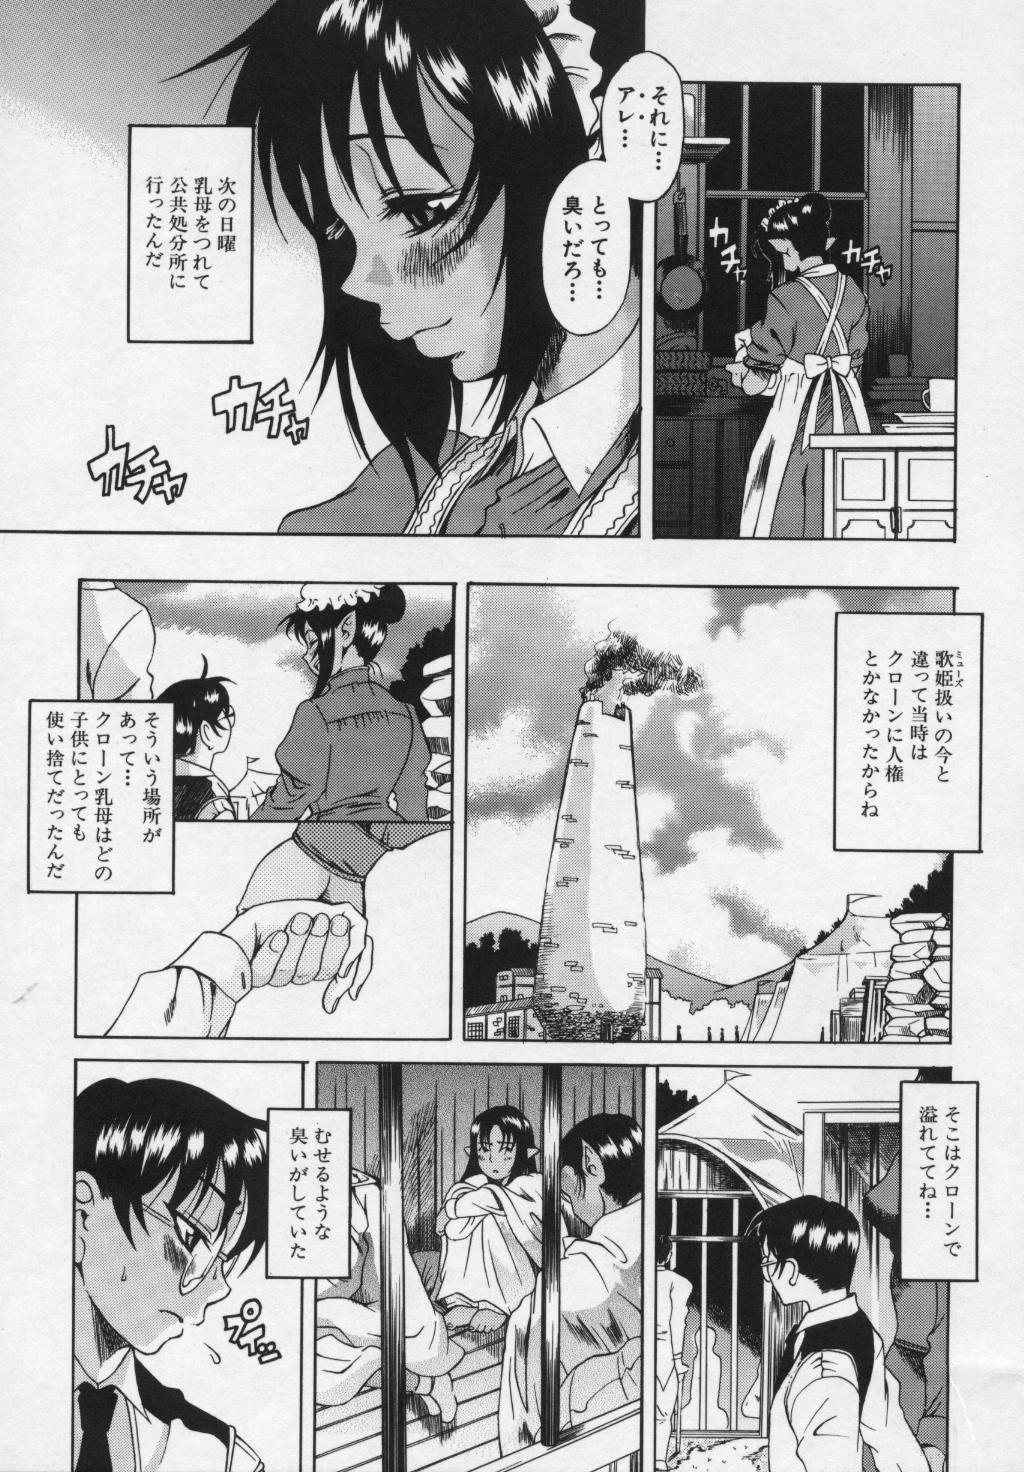 Kimi no Na o Yobeba - If I call your name. 161